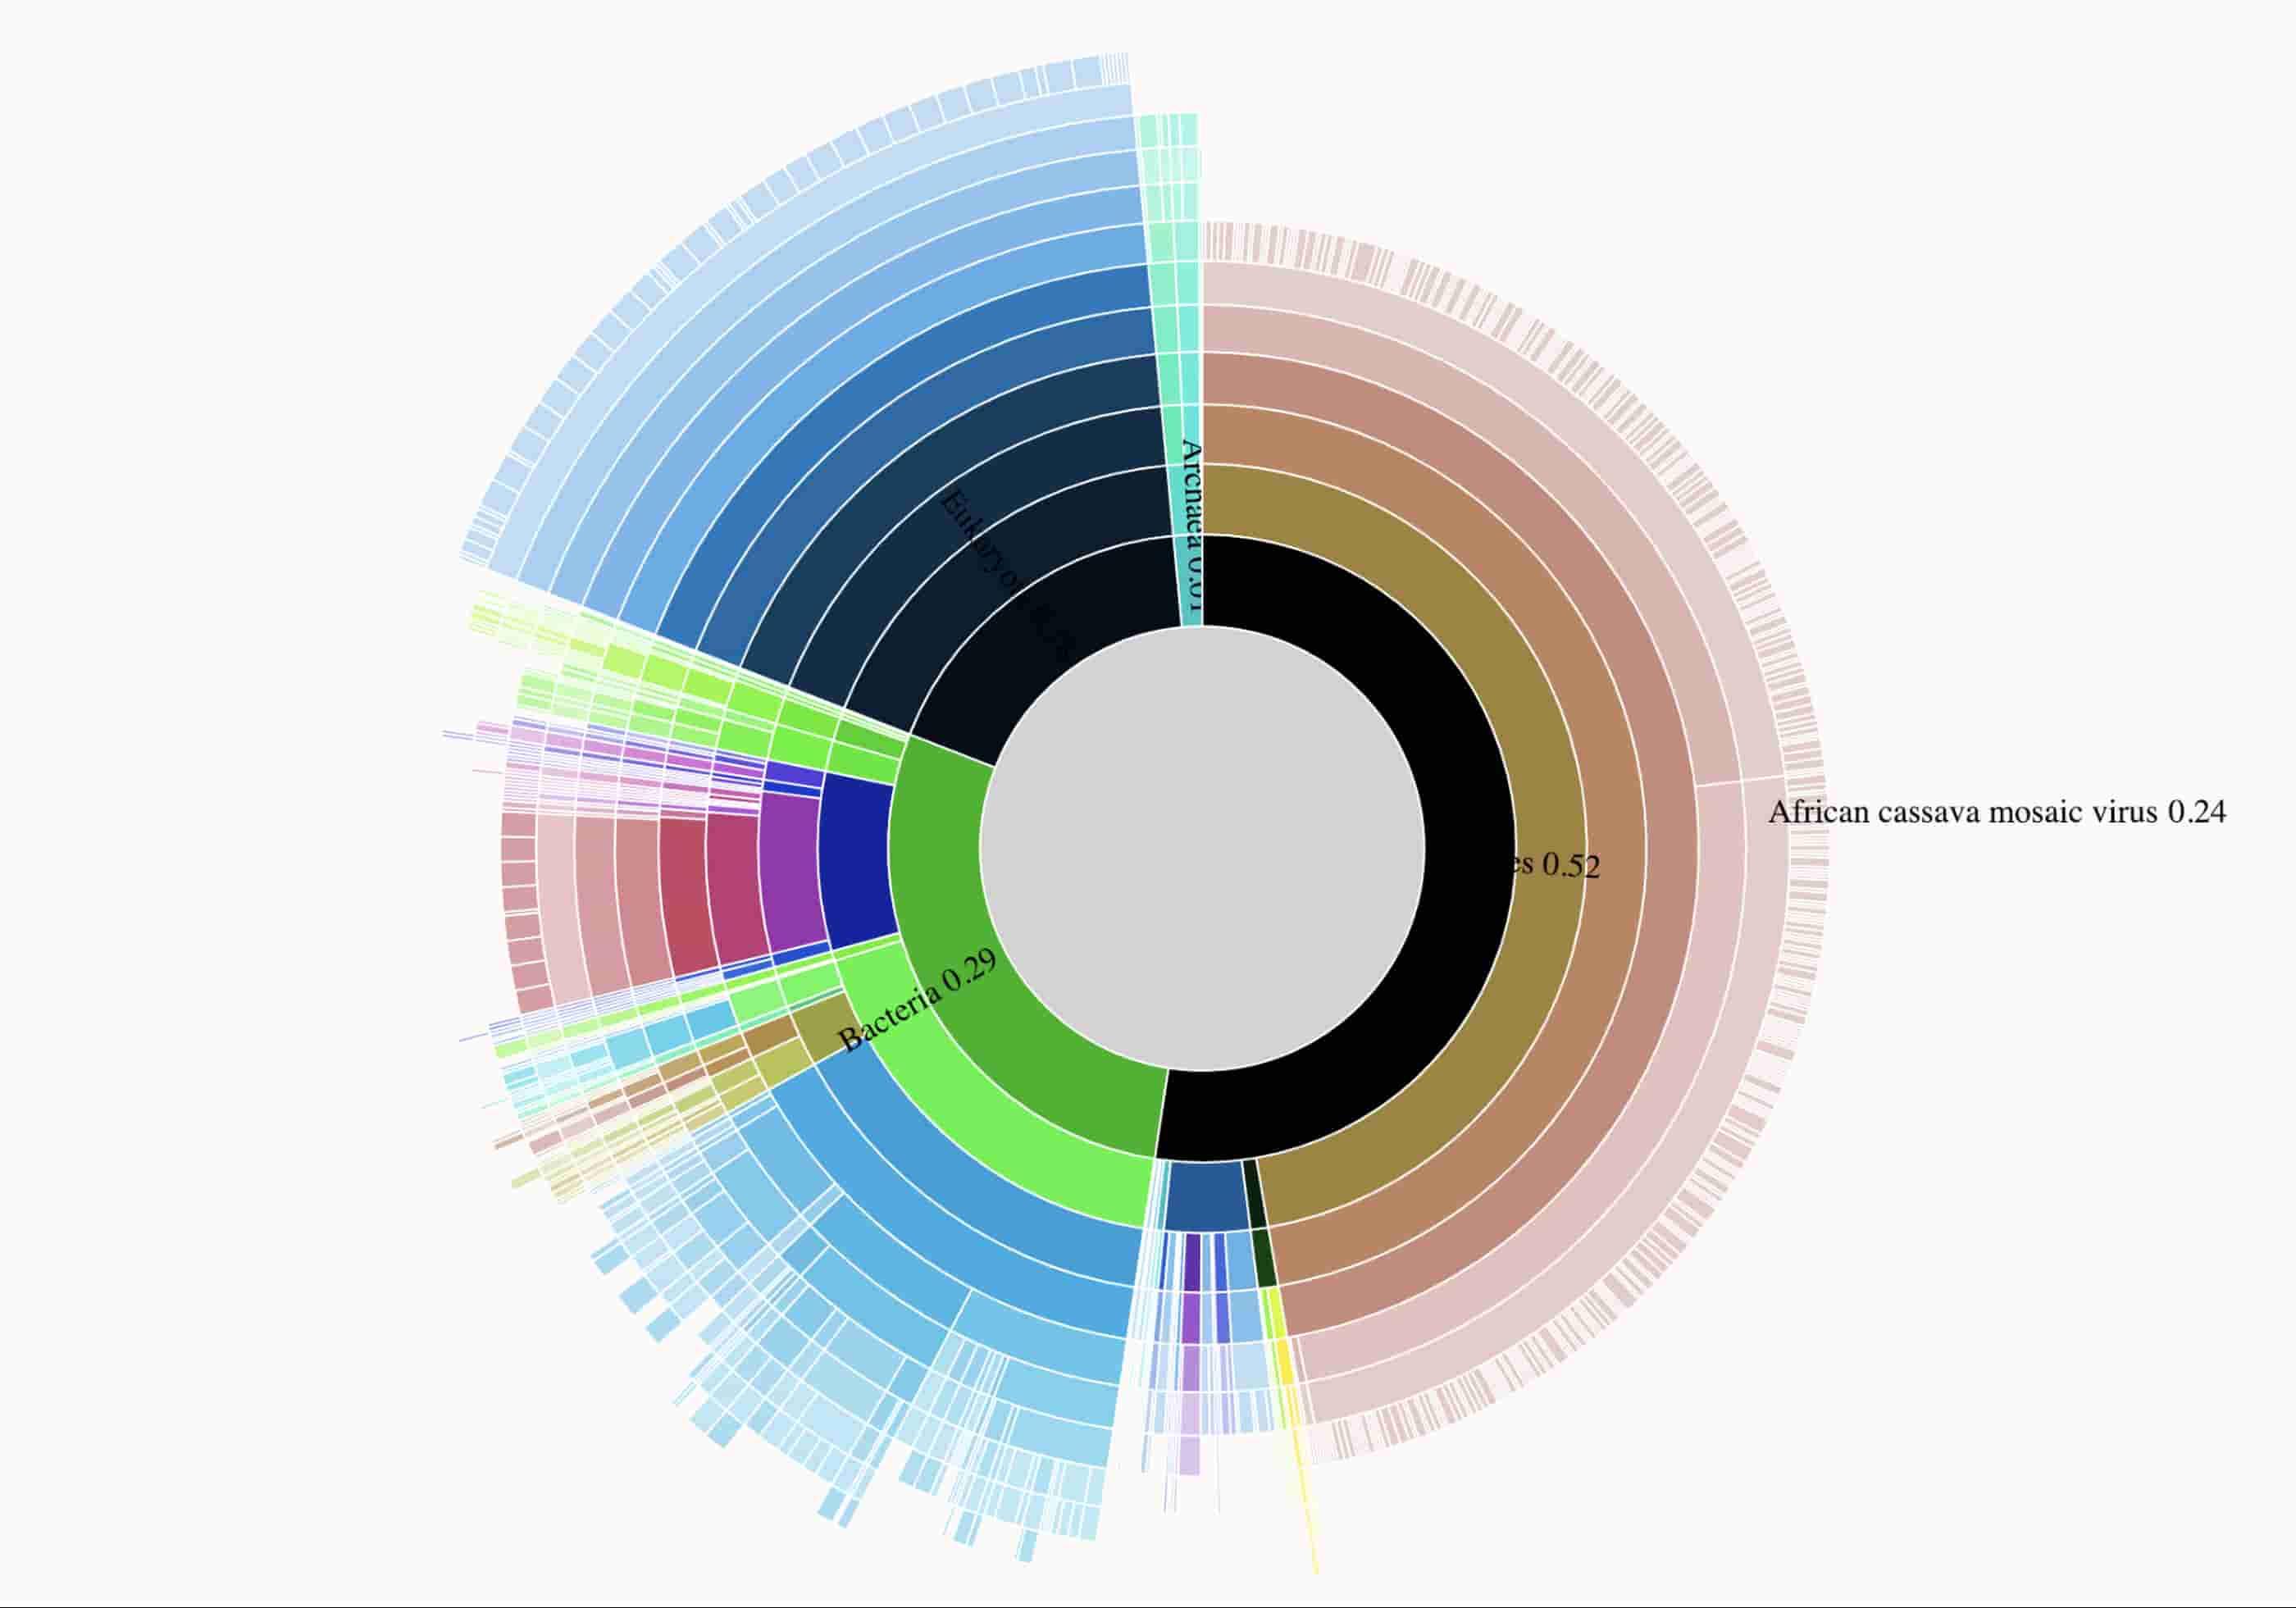 6_data visualization.png